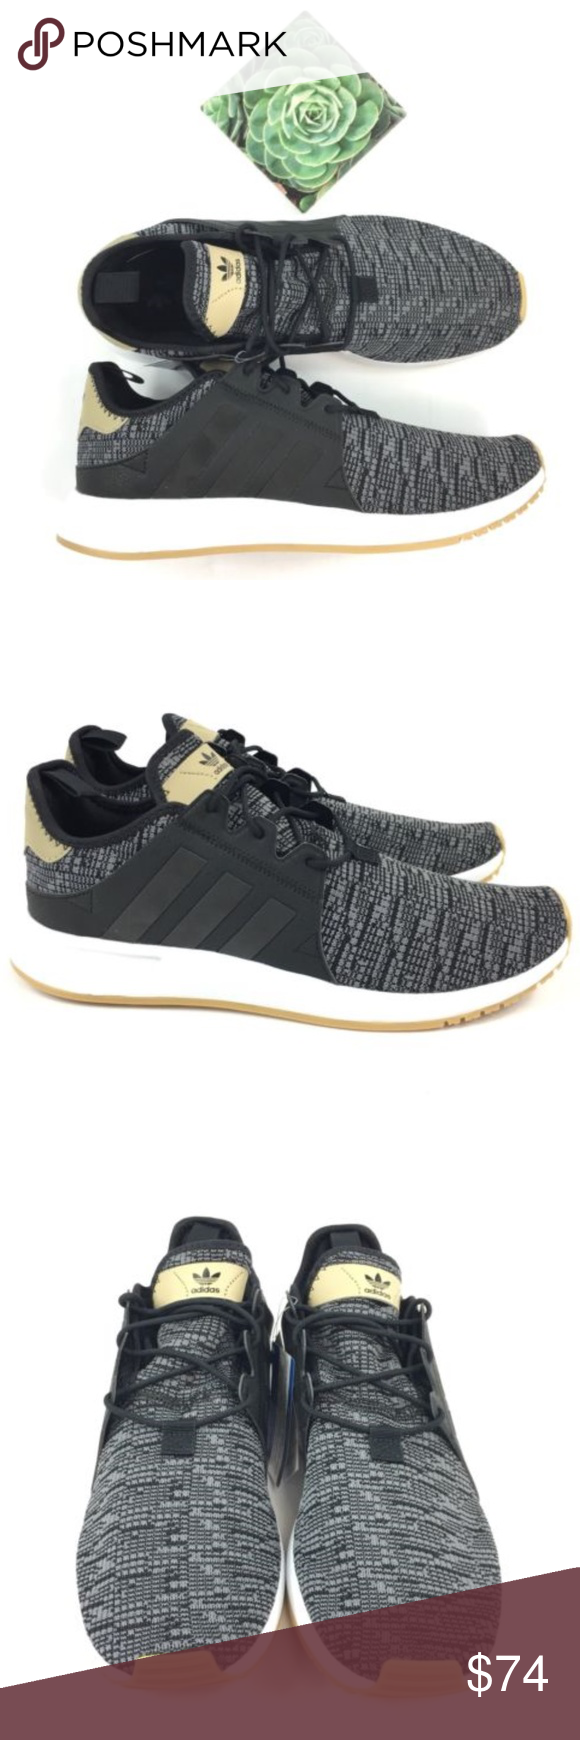 094eff2955d Adidas Originals X PLR AH2360 Men s Sneakers NWT Adidas Originals X PLR AH2360  Men s Sneakers Size 9.5 Orrtholite Black Gum Authentic - Bought at Adidas  ...